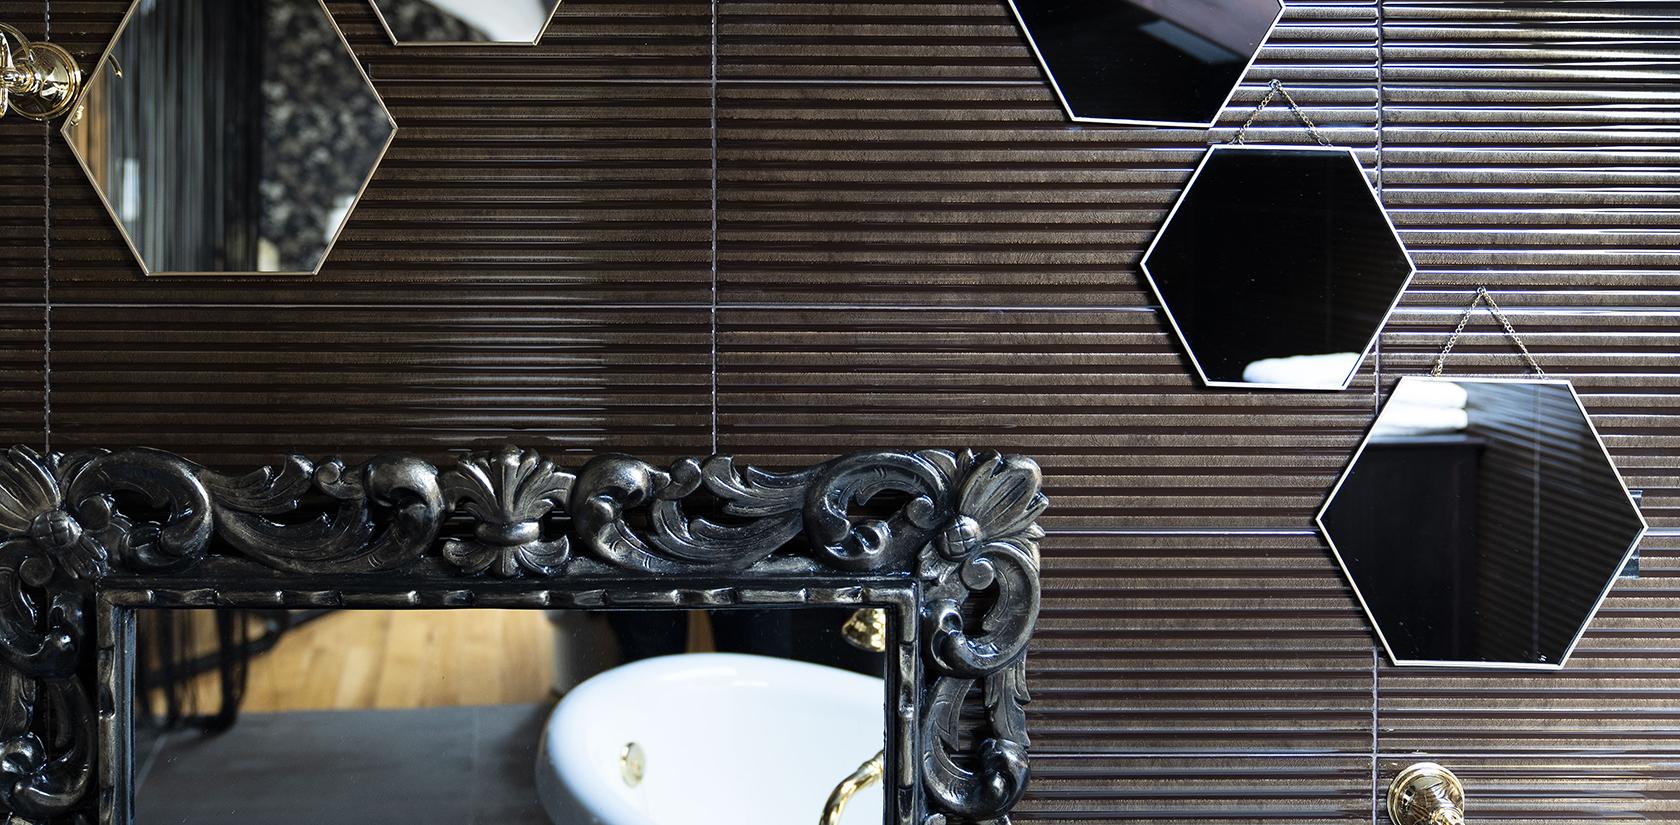 Habitación Malveiras, detalle del baño